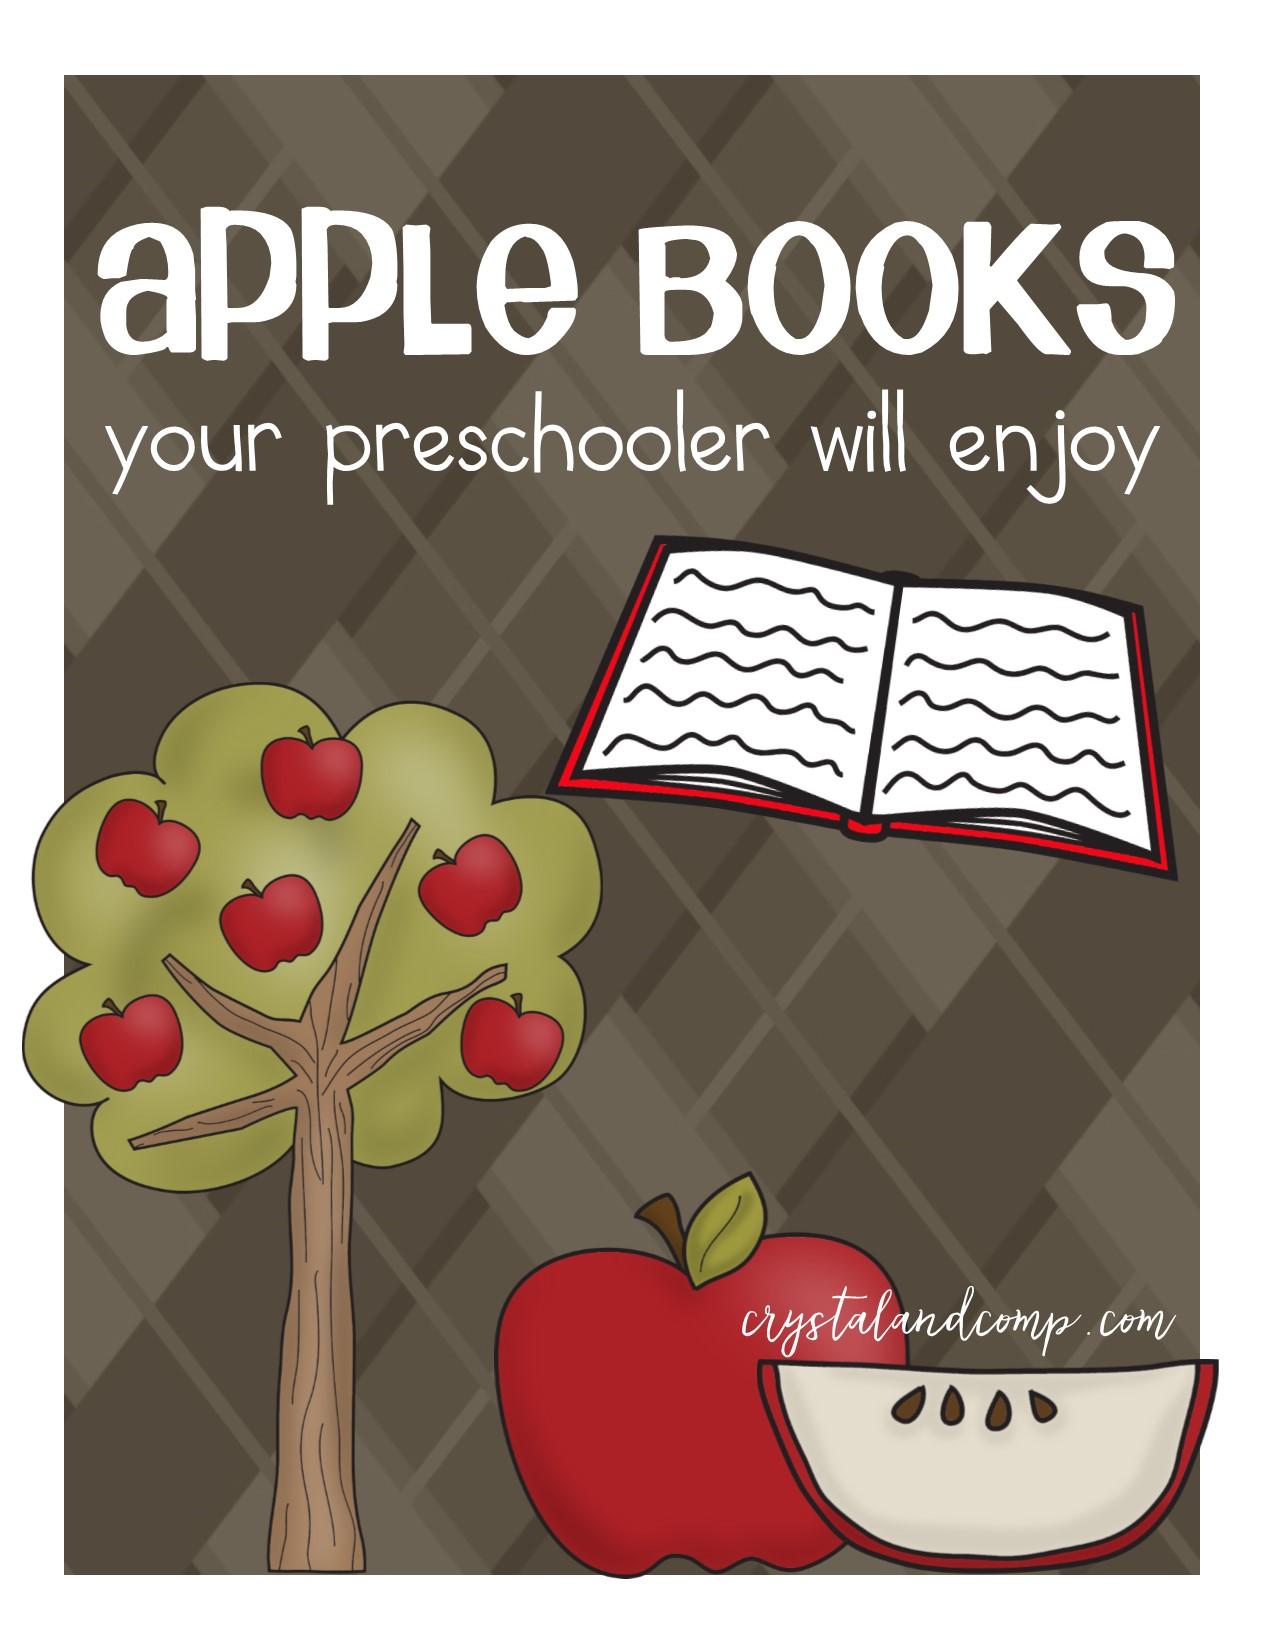 21 Amazing Apple Books For Preschoolers